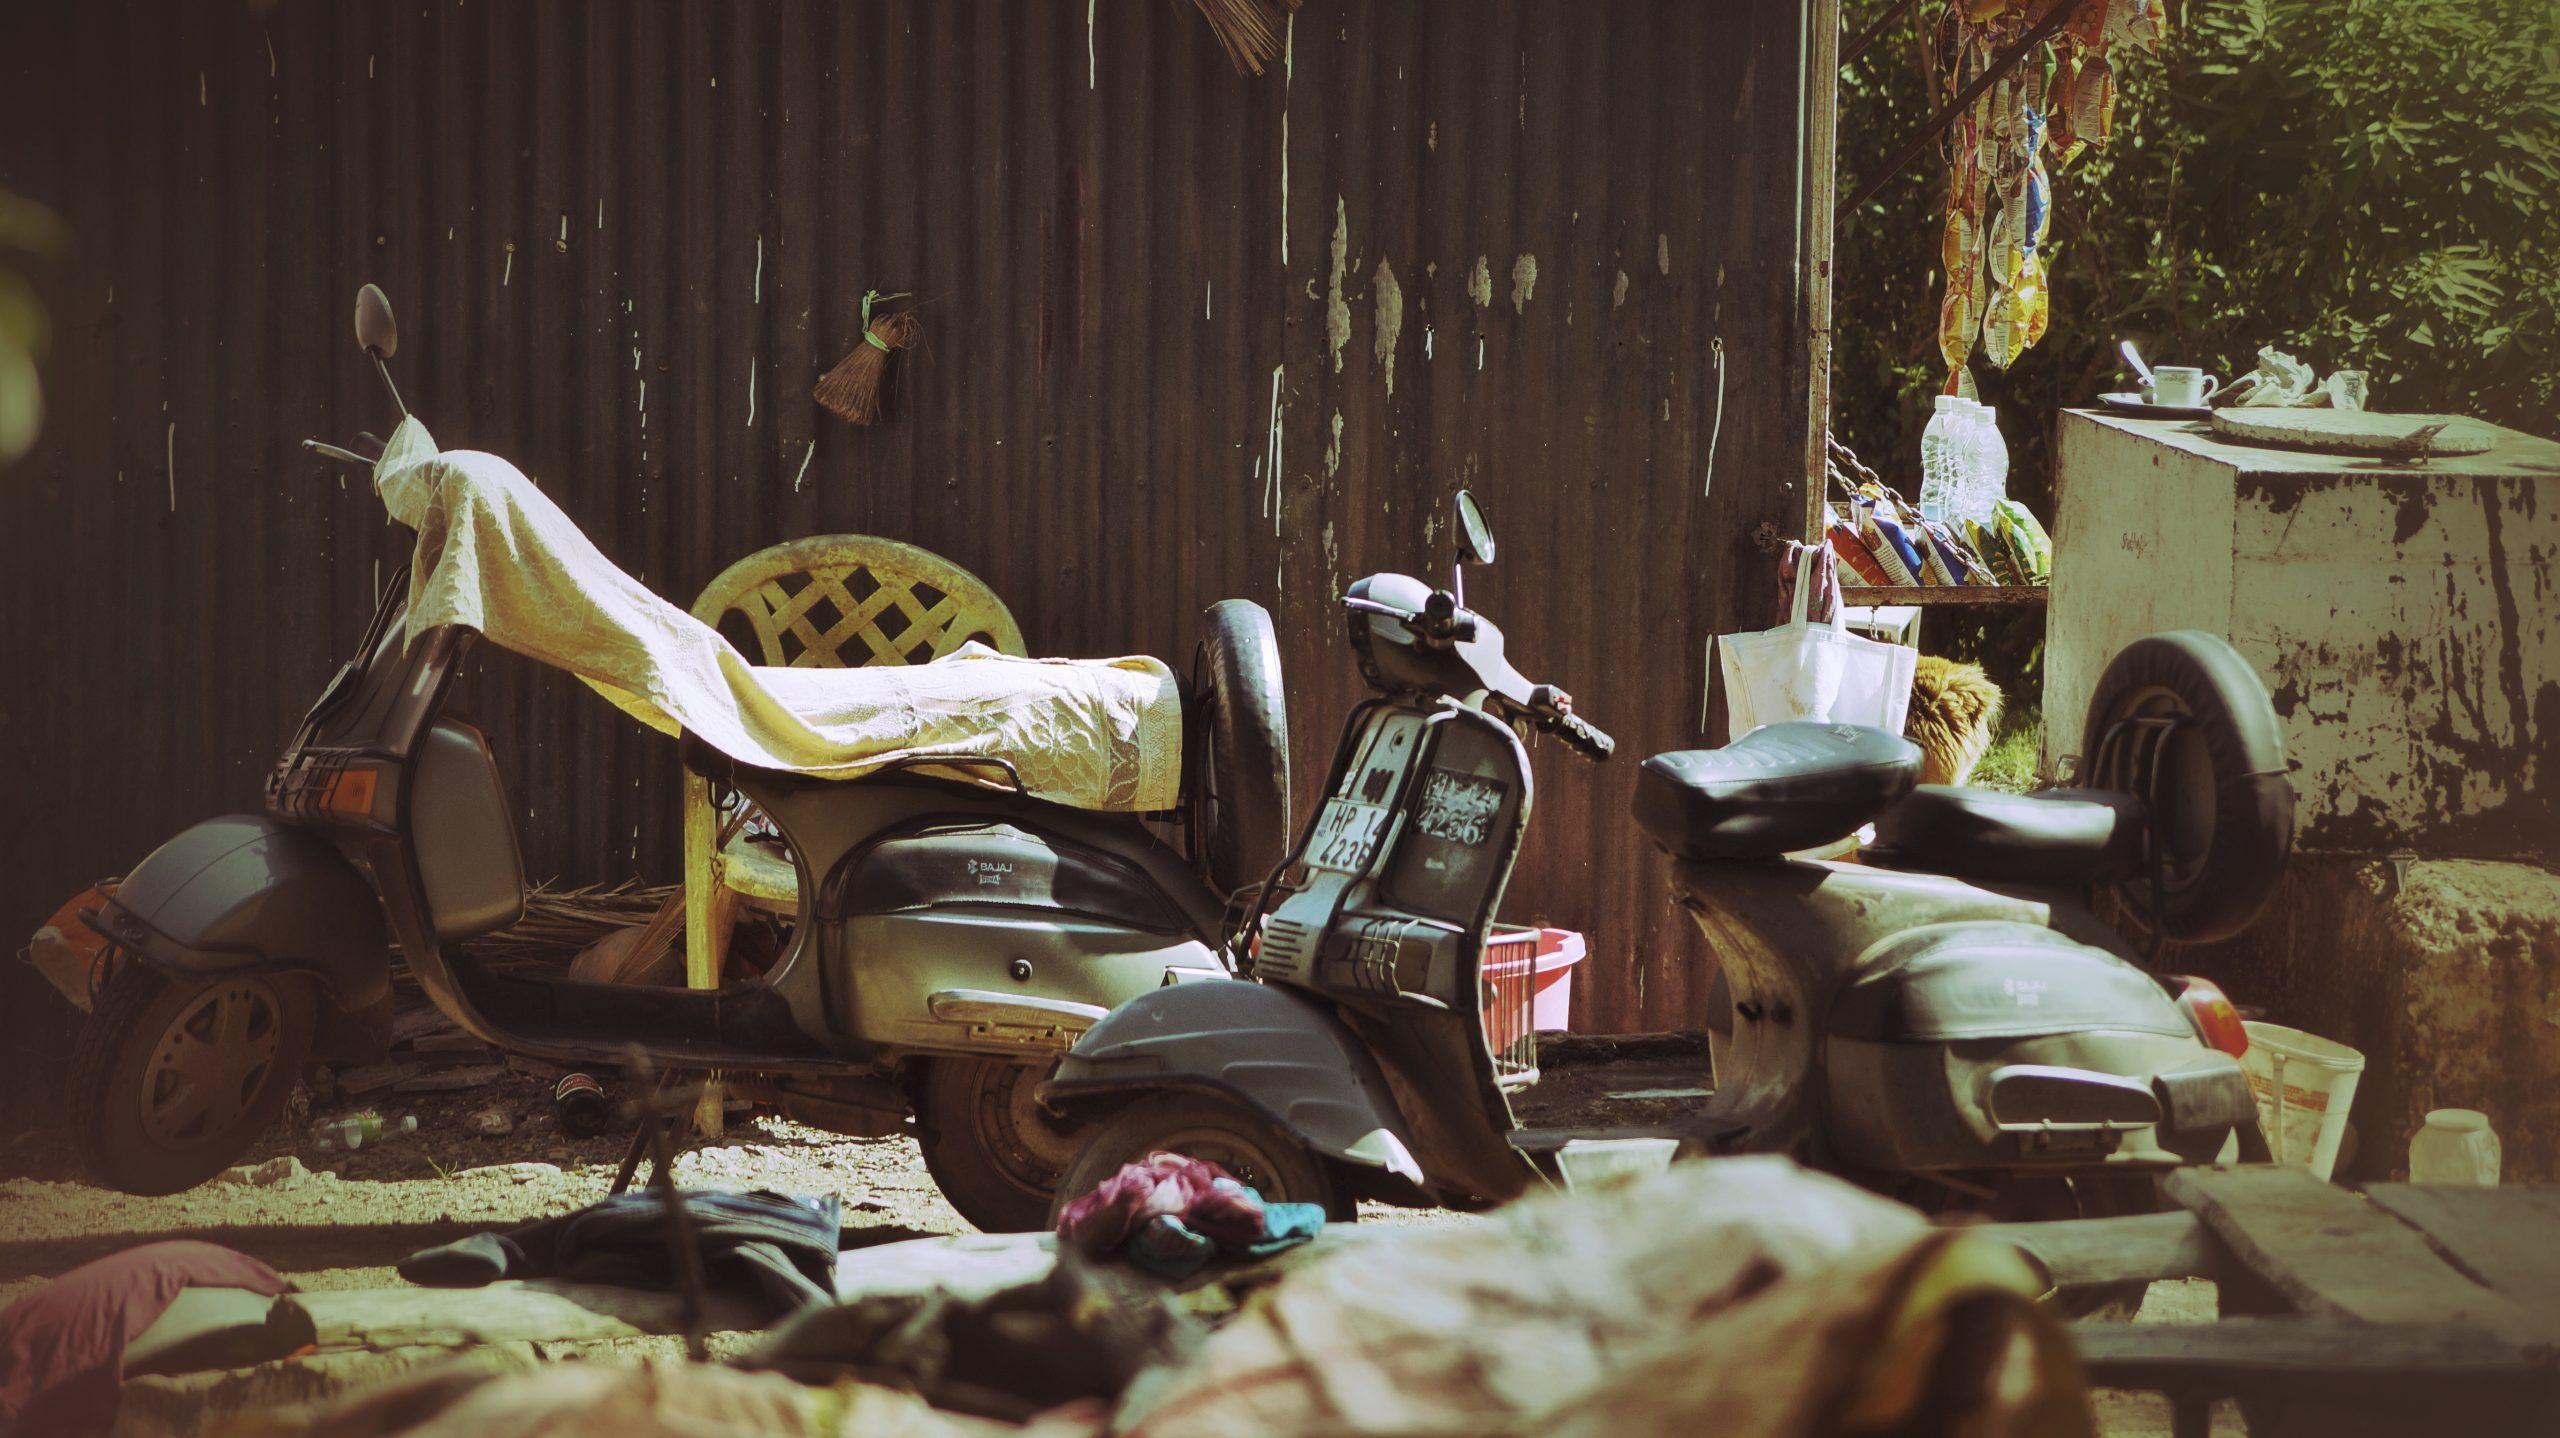 Old Bajaj chetak scooters